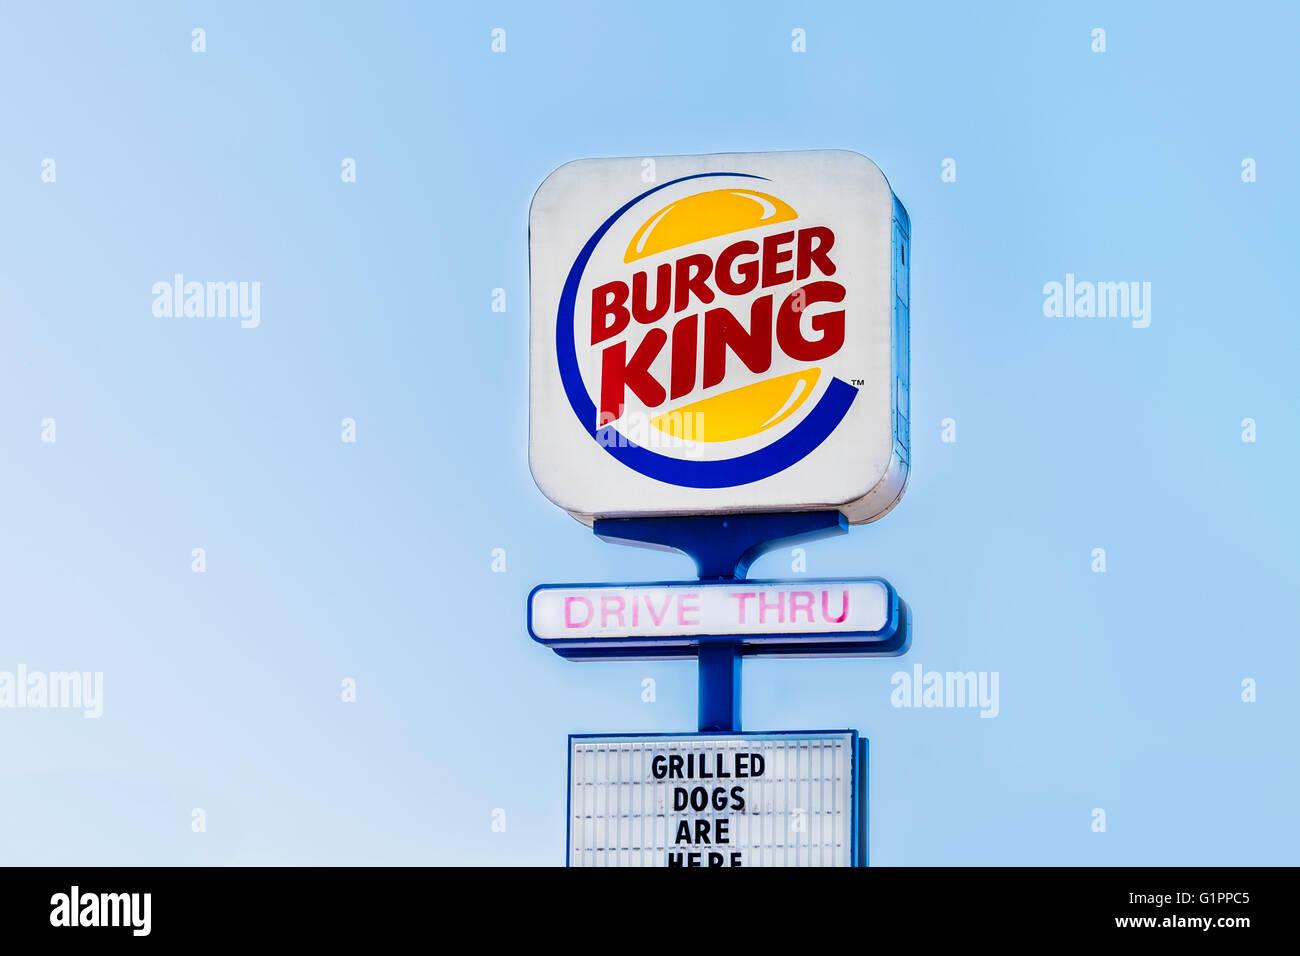 A Pole Sign Advertising Burger King Fast Food Hamburger Restaurant In Oklahoma City USA